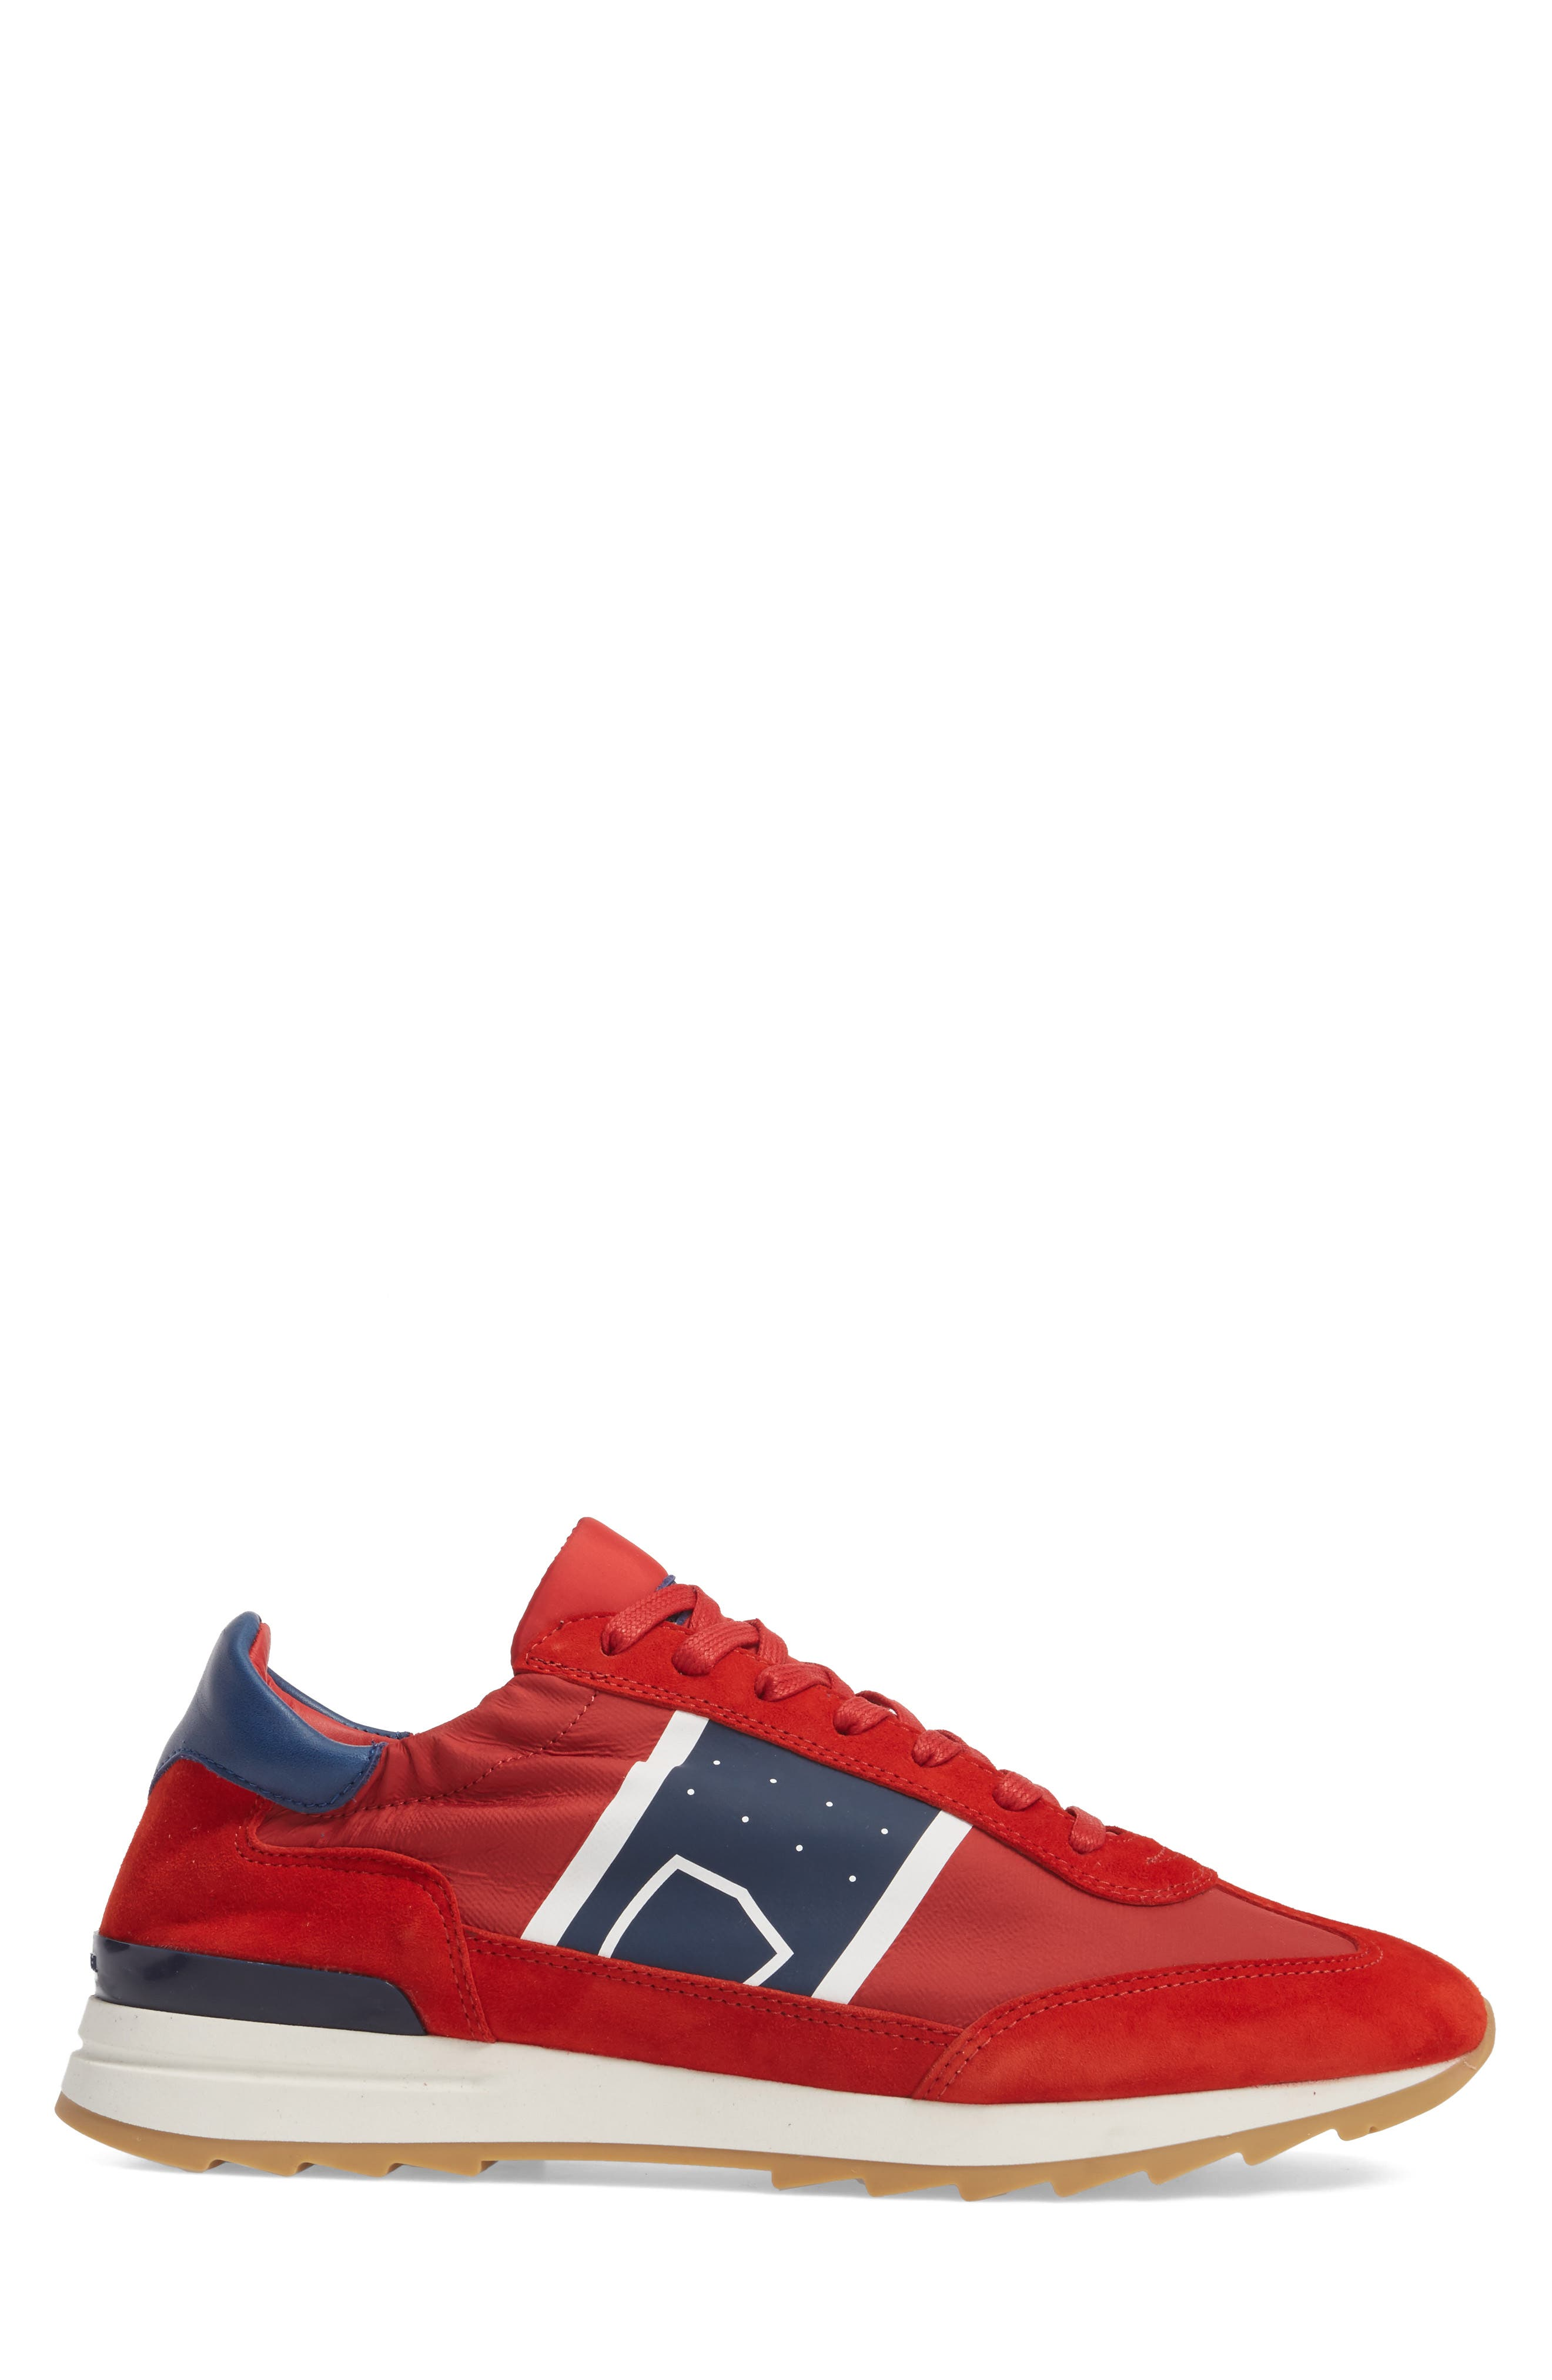 Toujours Sneaker,                             Alternate thumbnail 3, color,                             Red/ Blue